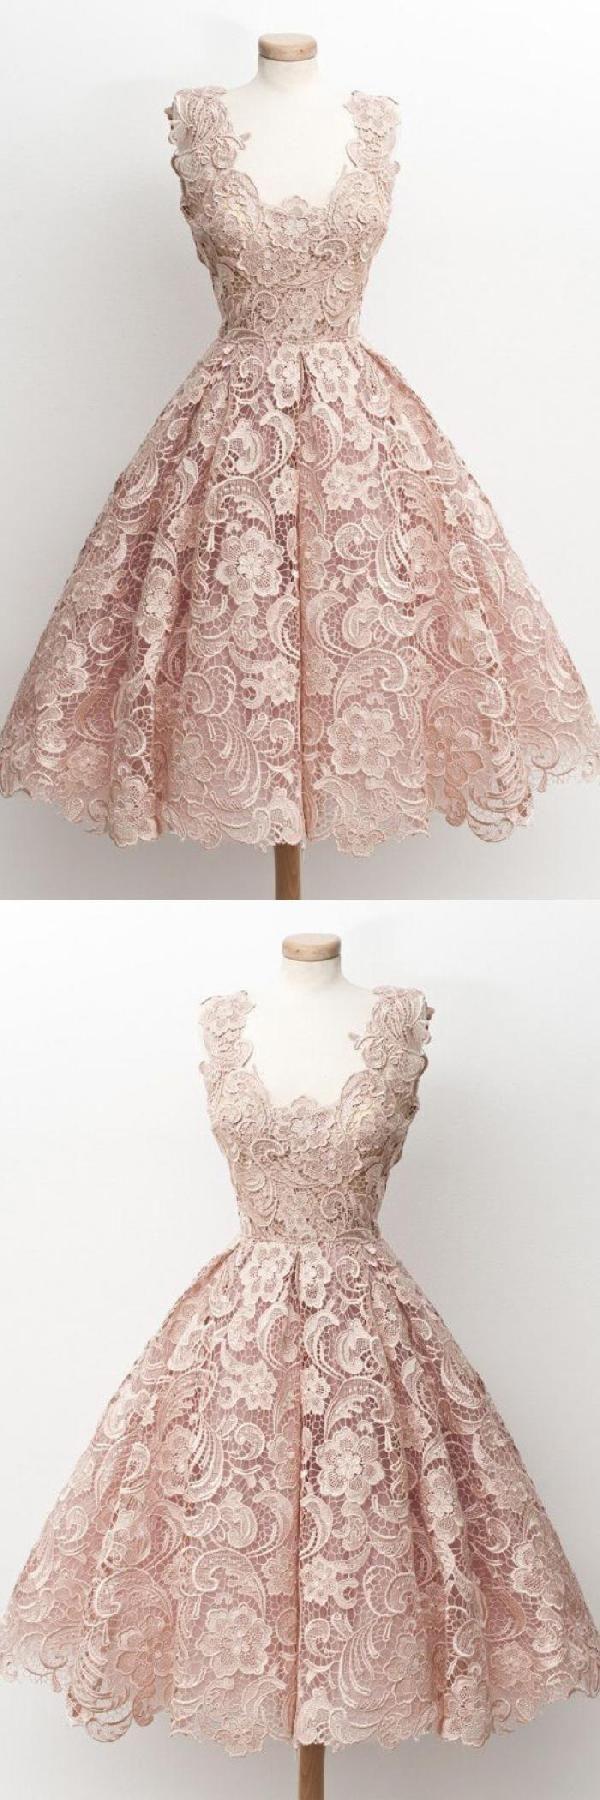 Custom made fine vintage prom dresses blush prom dresses lace prom